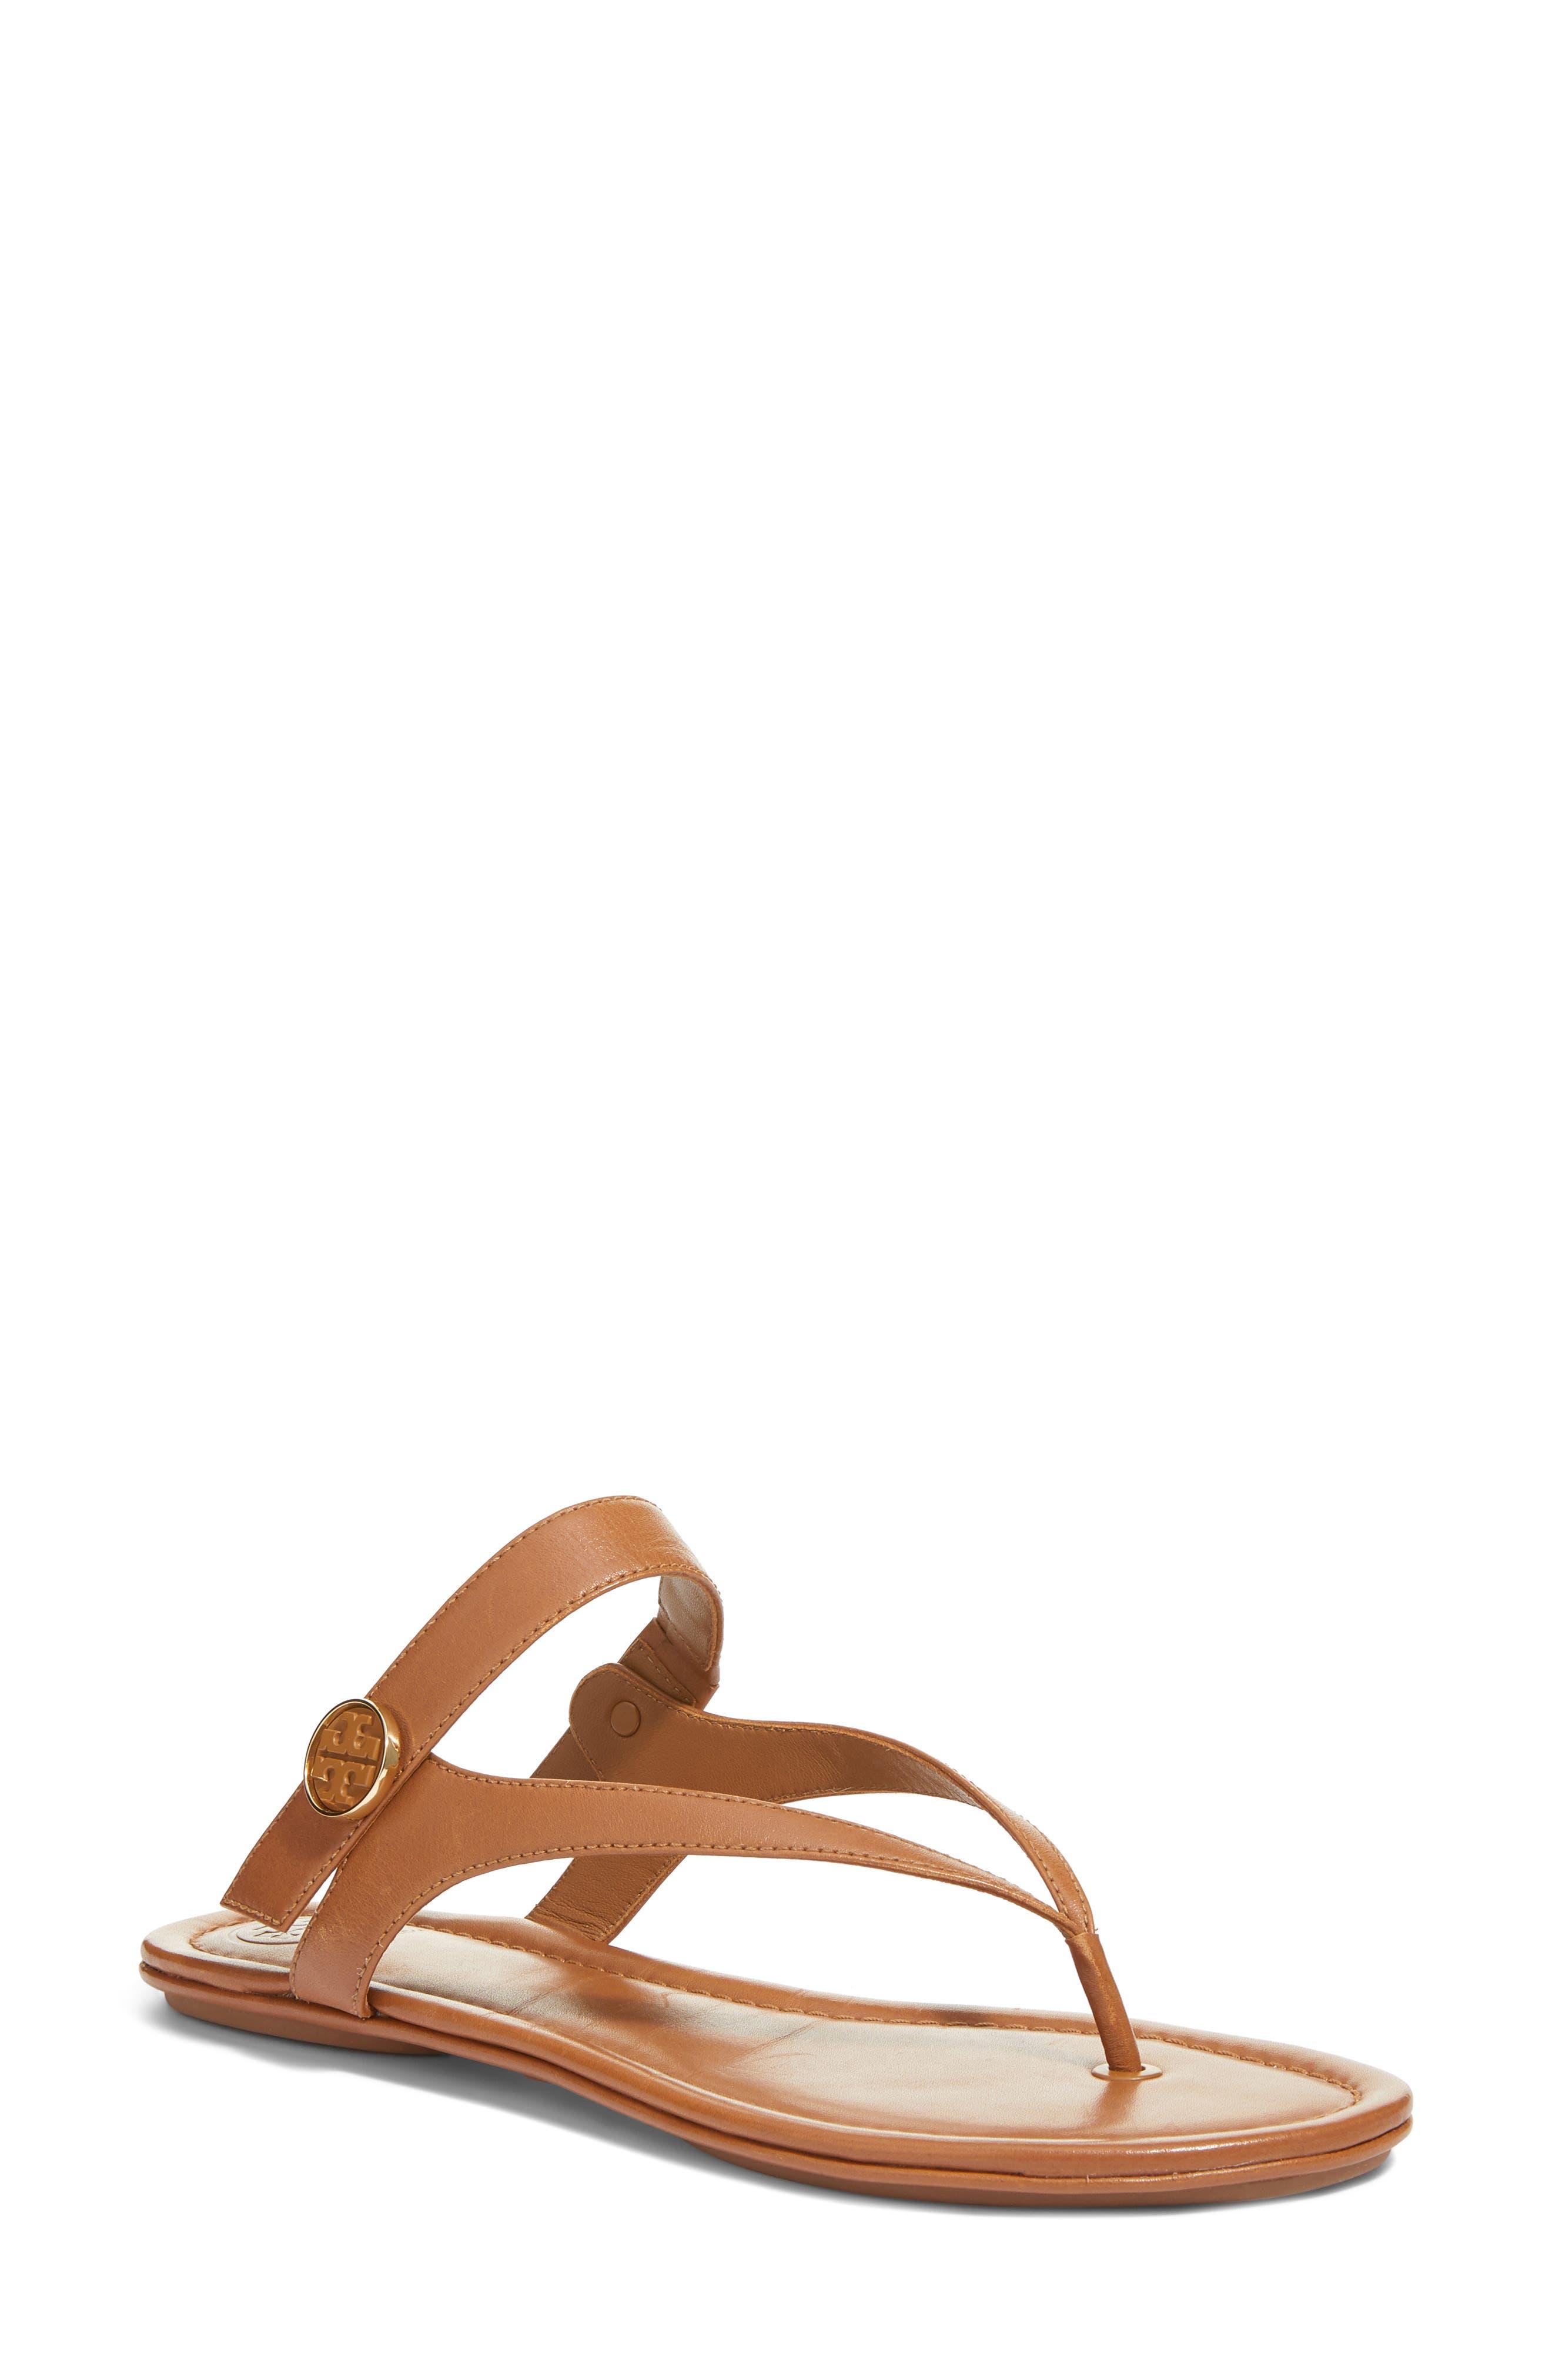 Alternate Image 2  - Tory Burch Minnie Travel Thong Sandal (Women)